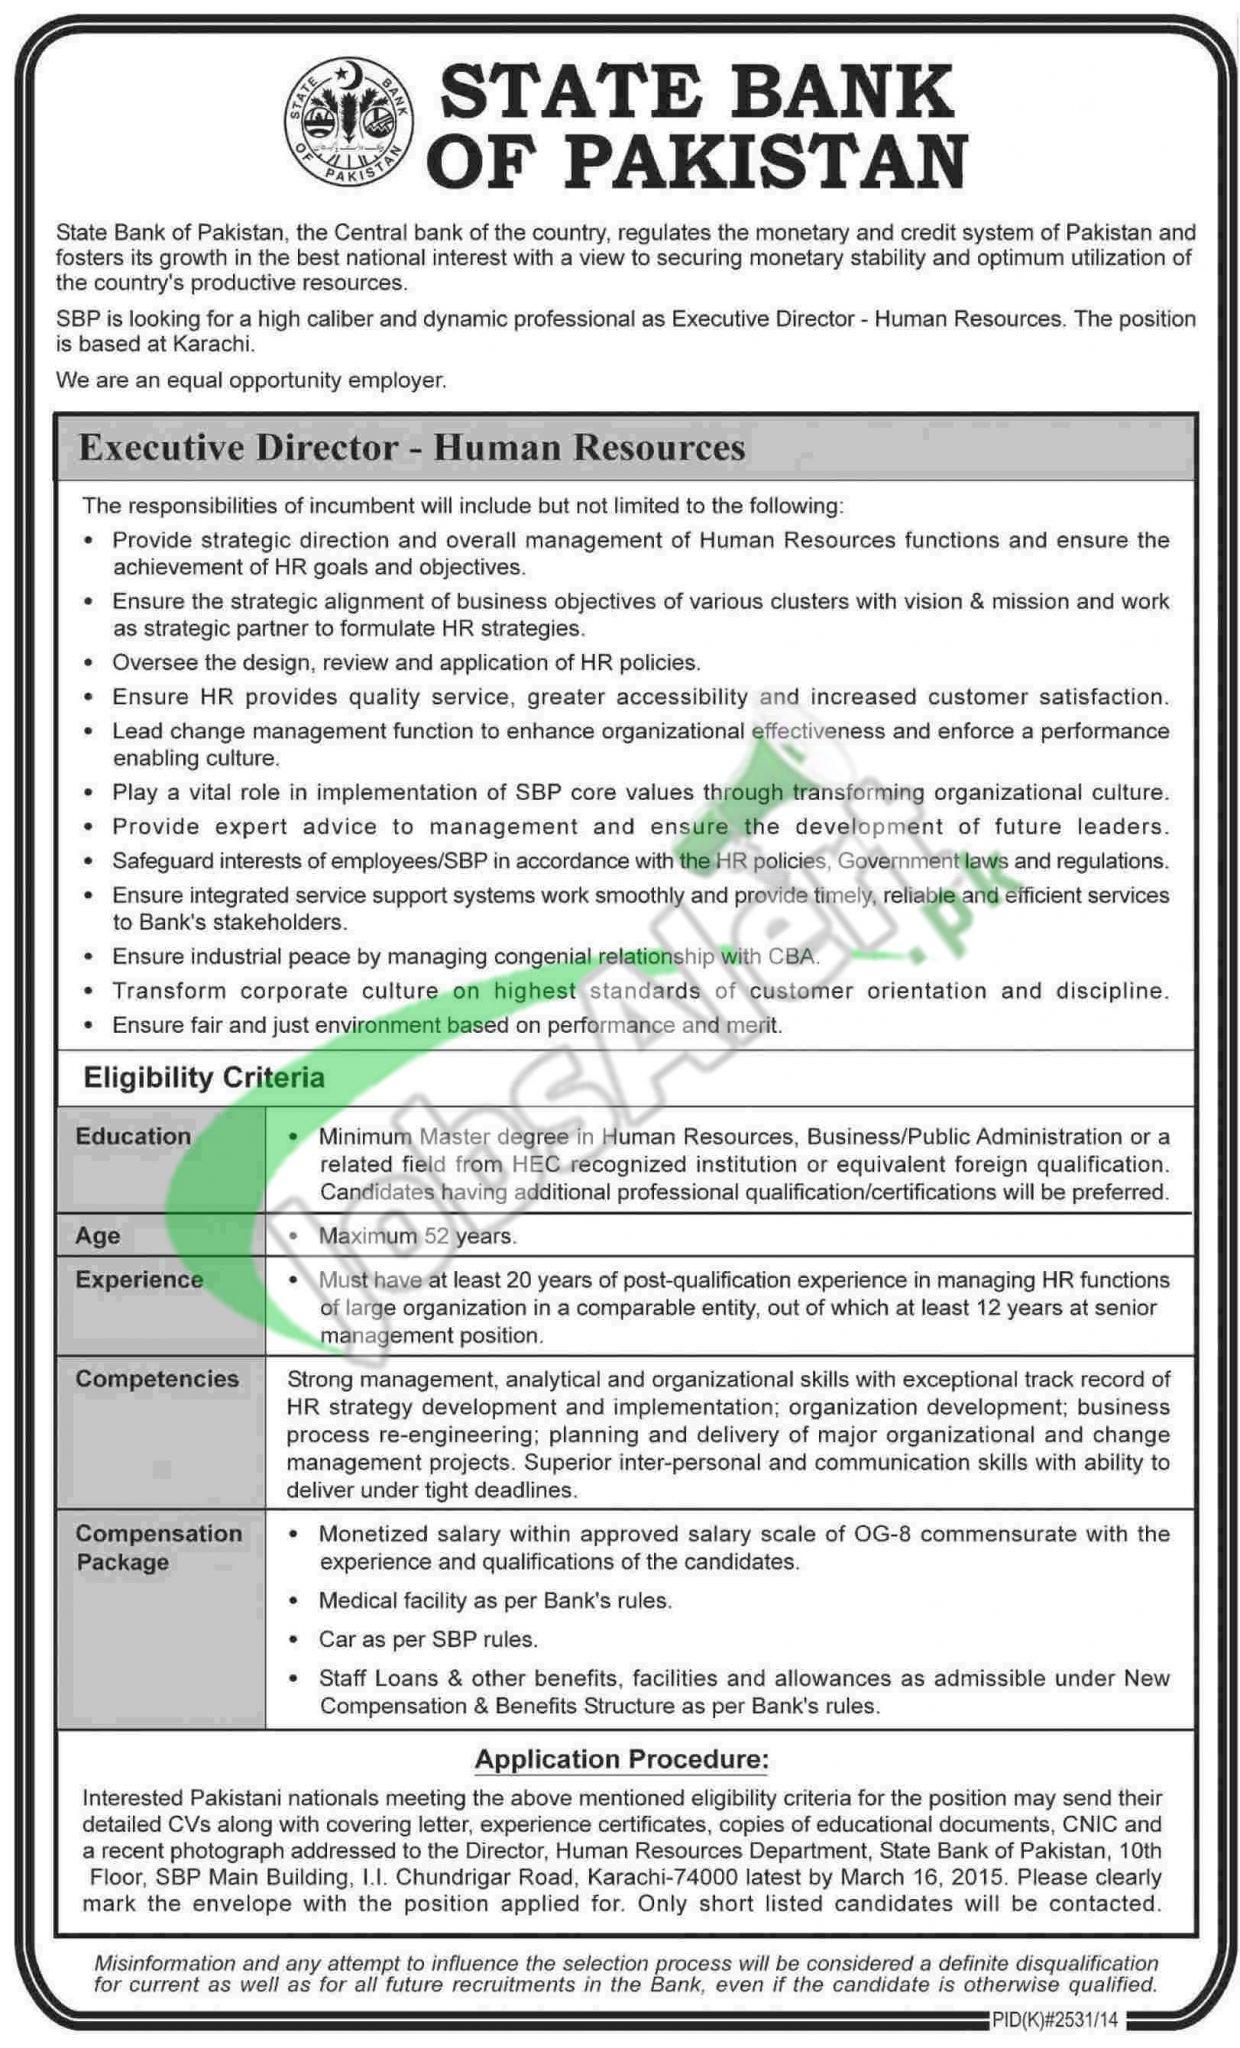 State Bank of Pakistan Jobs